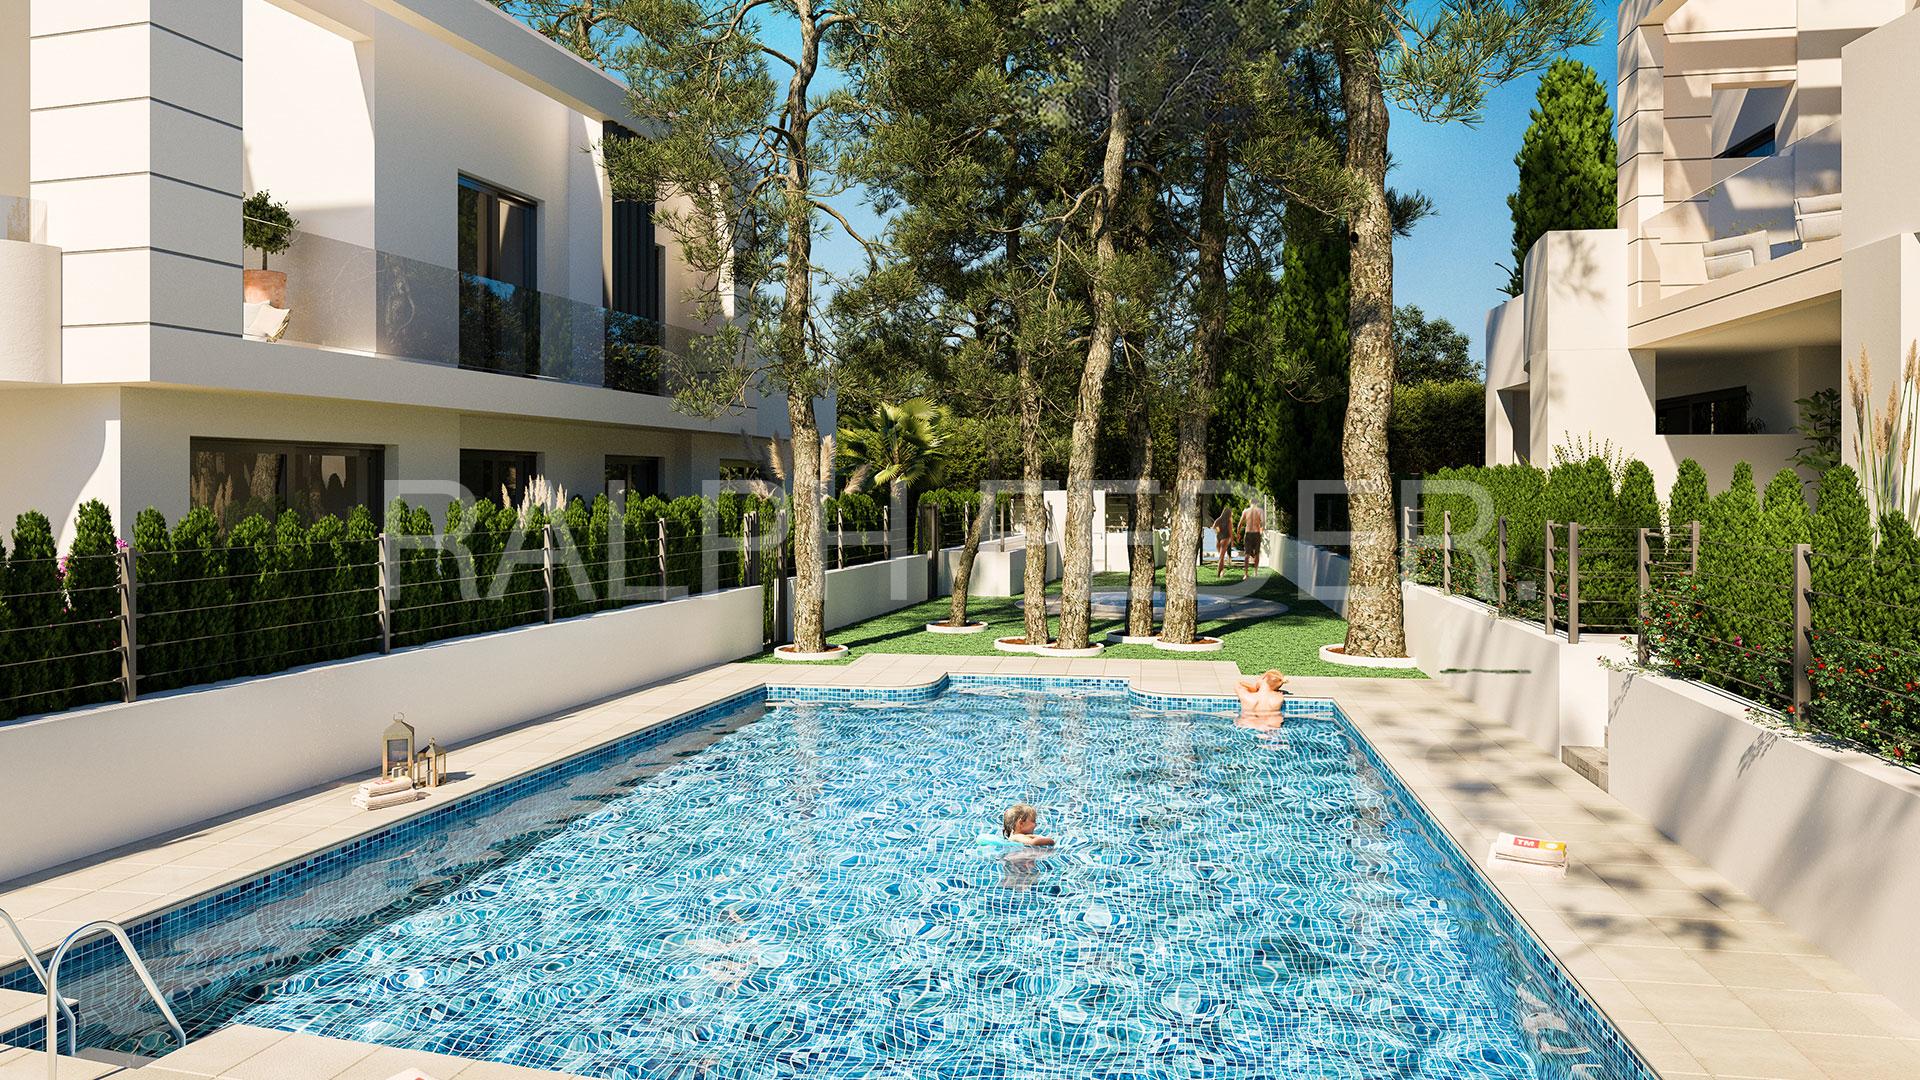 House in Estepona